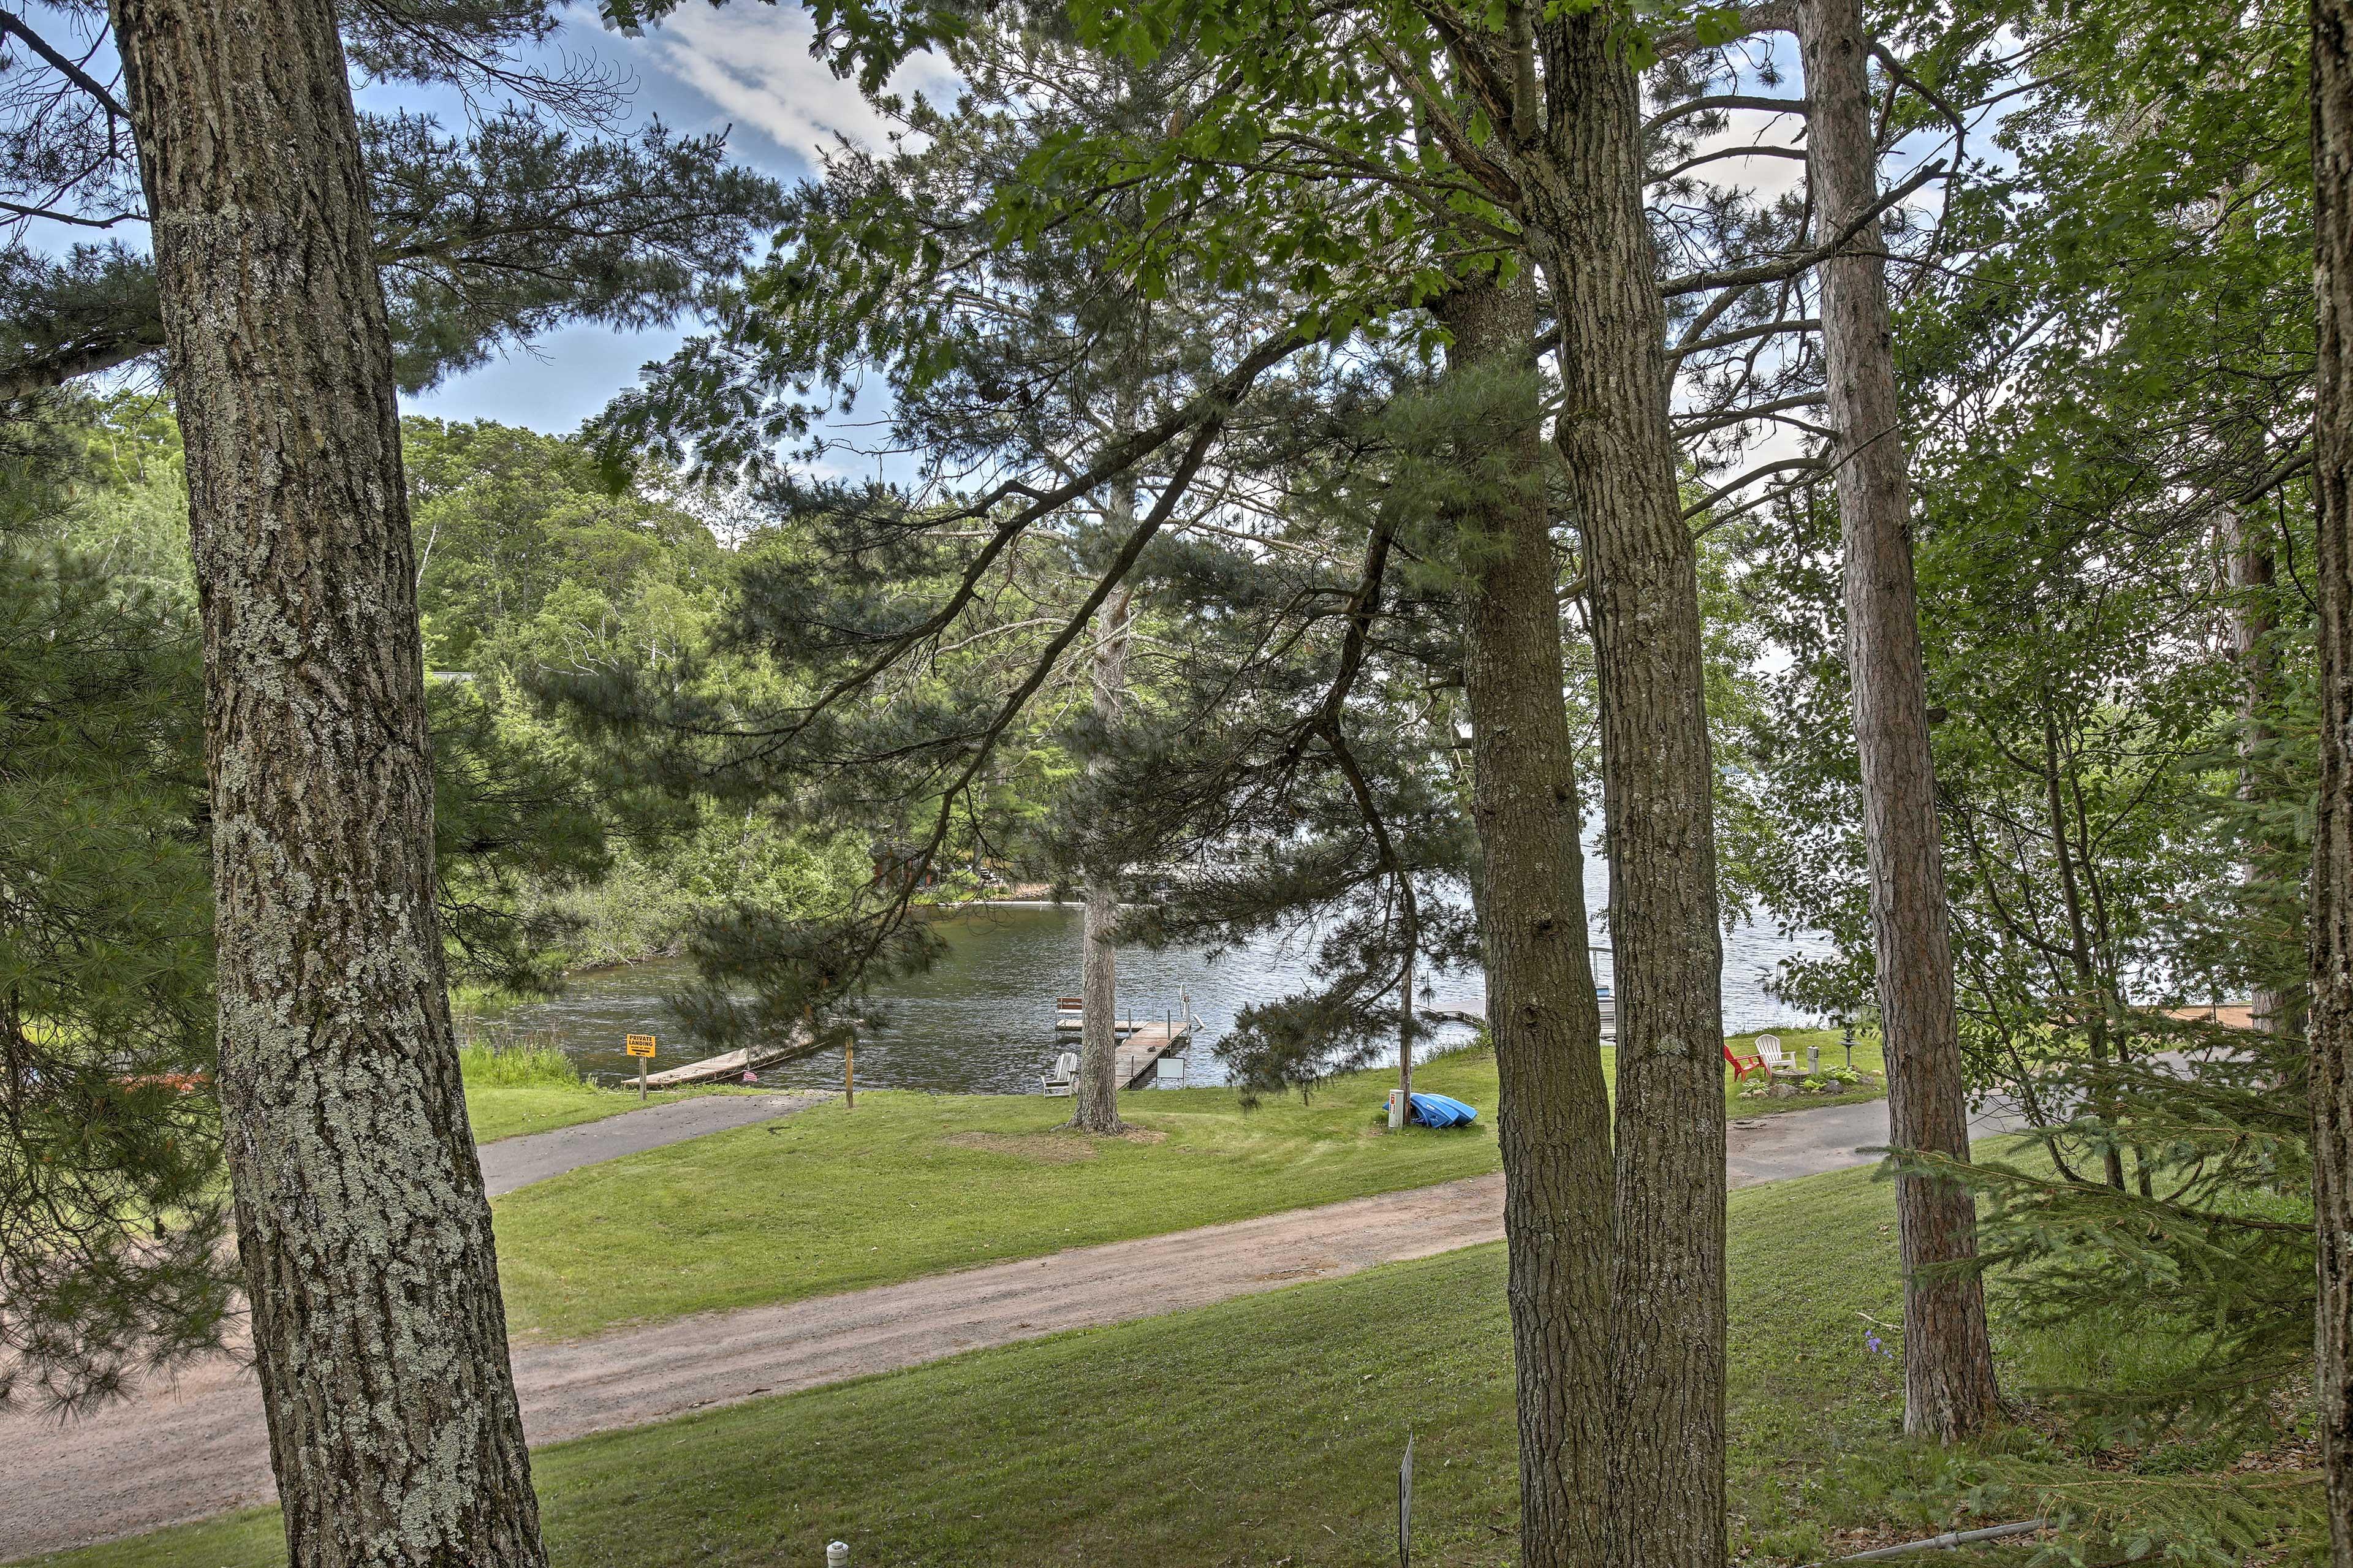 Resort Grounds | Lake Access